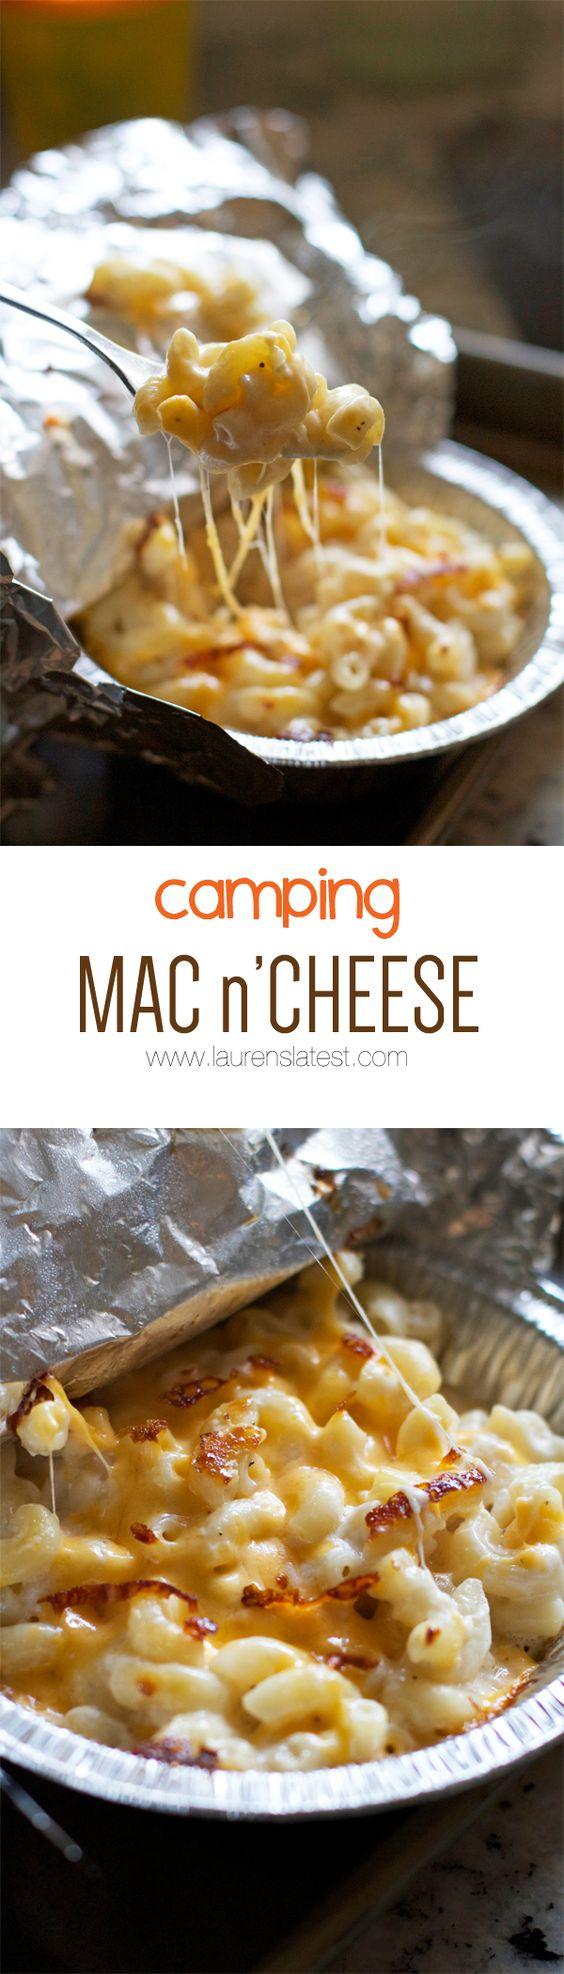 Kid-Friendly Camping Recipes That Kick Campfire Cooking Up A